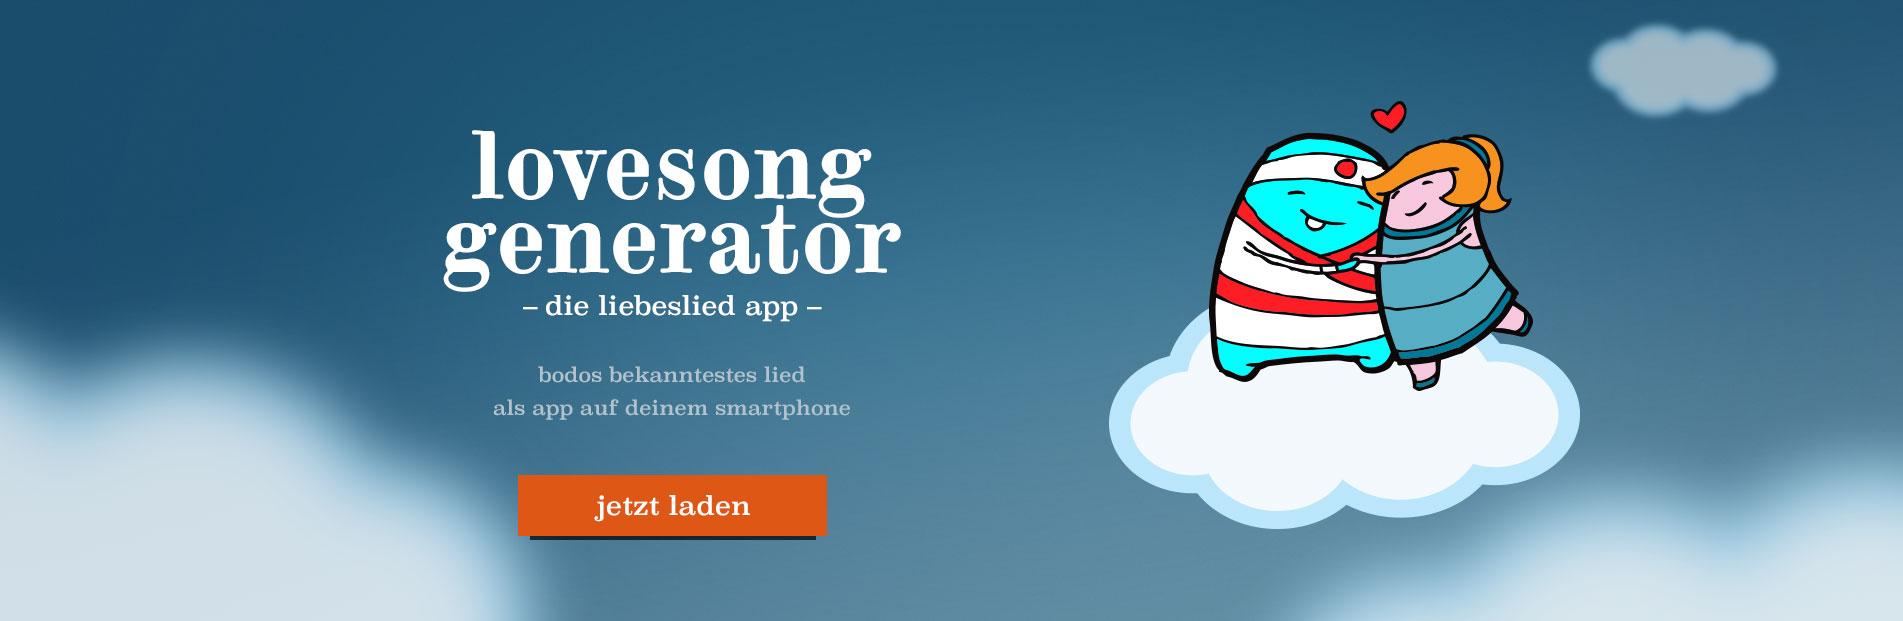 Lovesong Generator